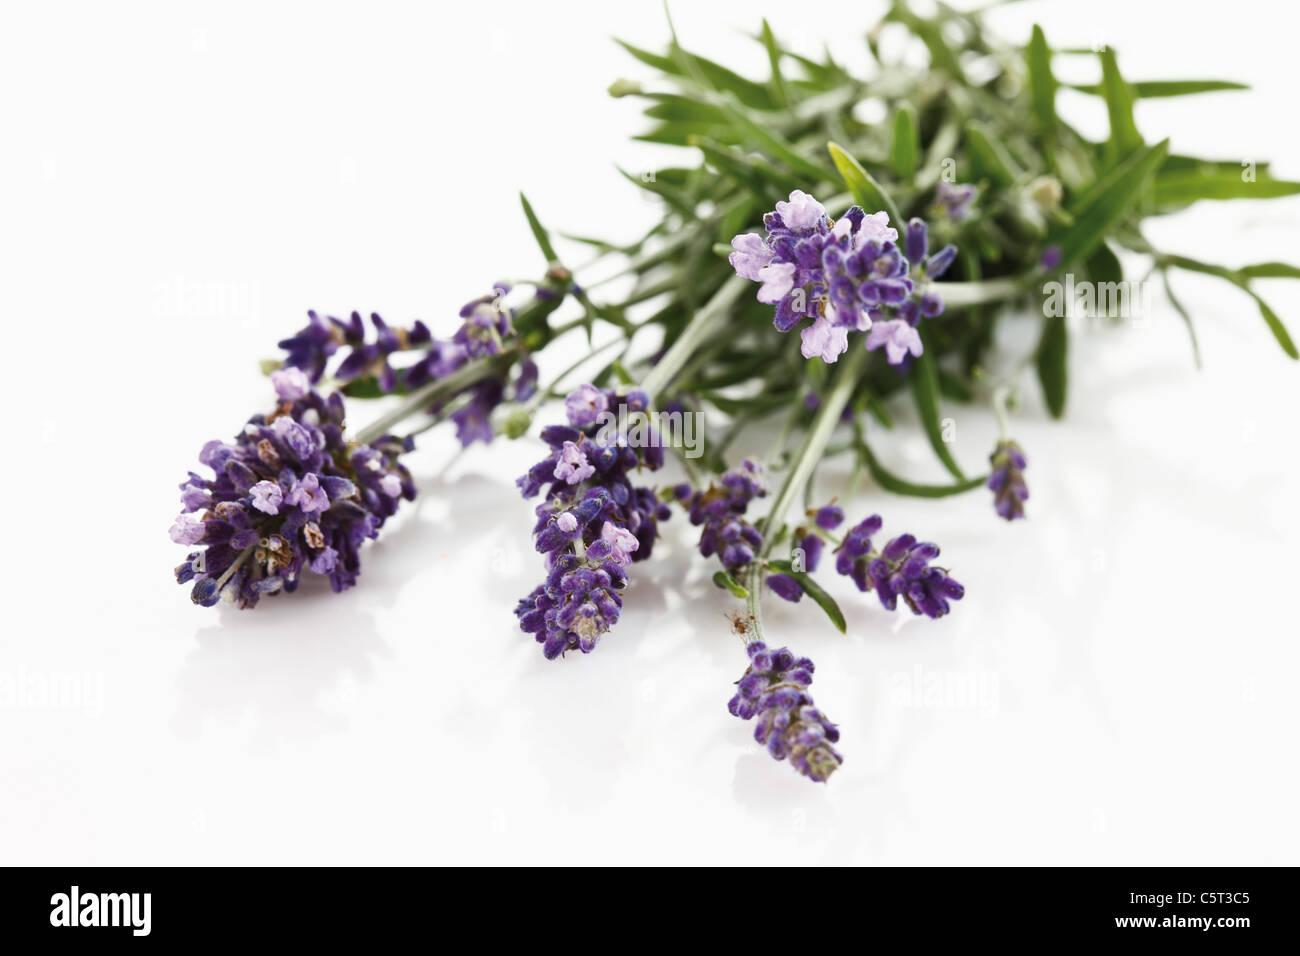 Bunch of lavender (Lavandula angustifolia), elevated view - Stock Image